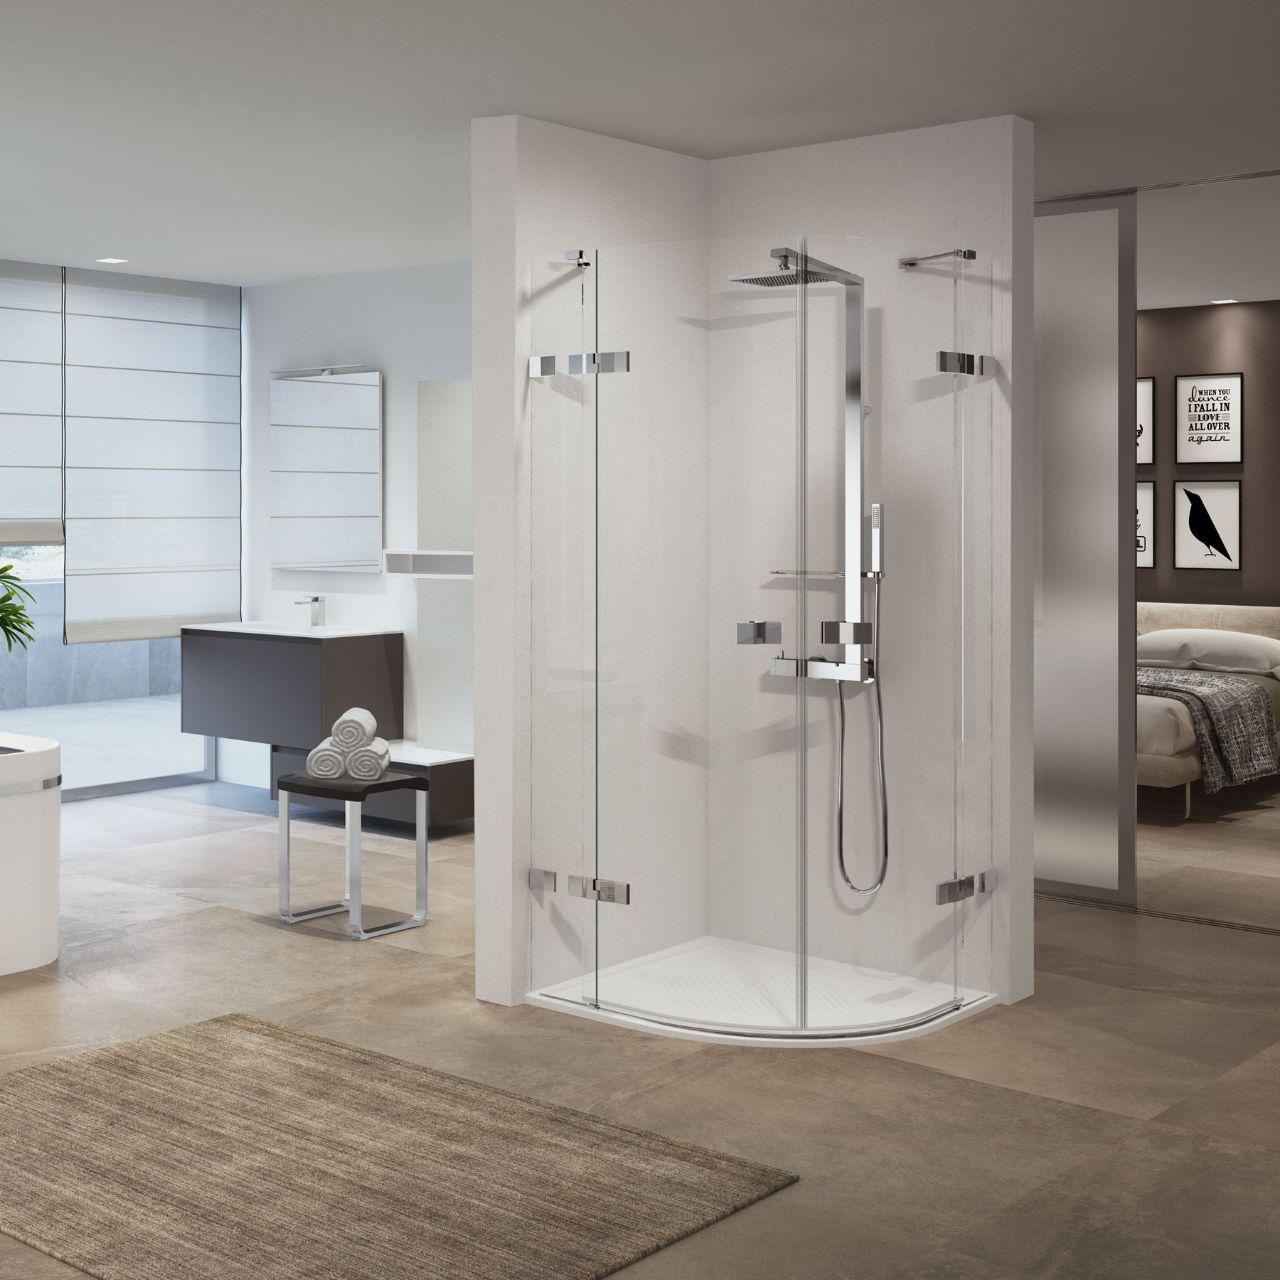 Cabinas De Ducha Gala:Mamparas de ducha Gala 2 R – Novellini